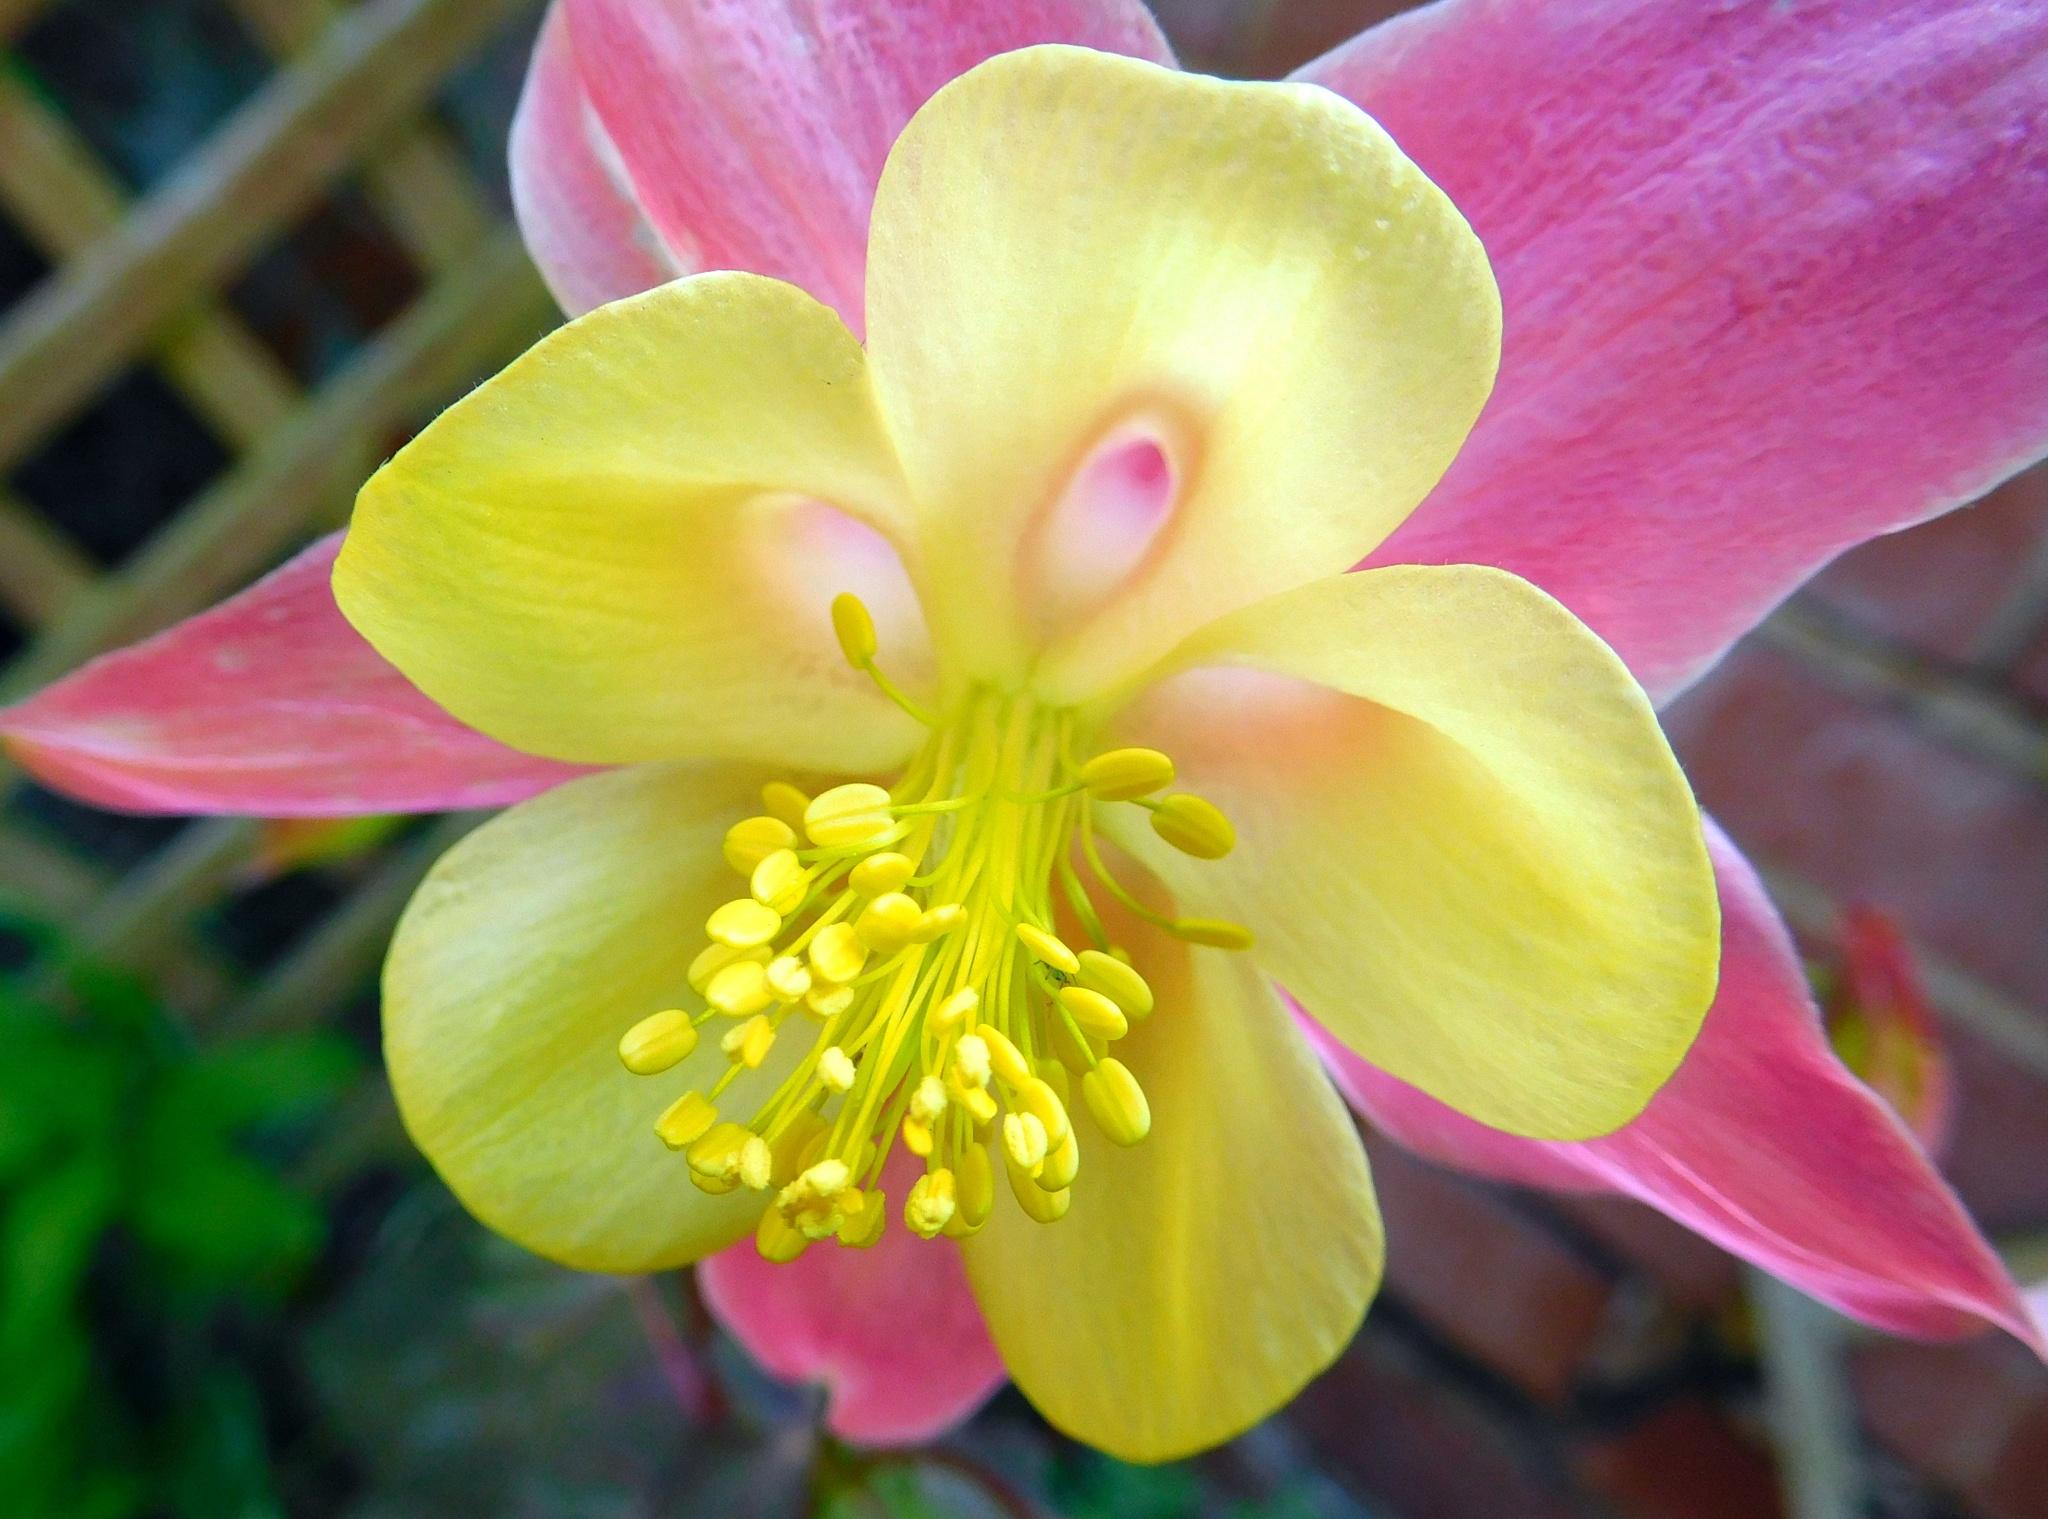 Flower by Joe Donnison